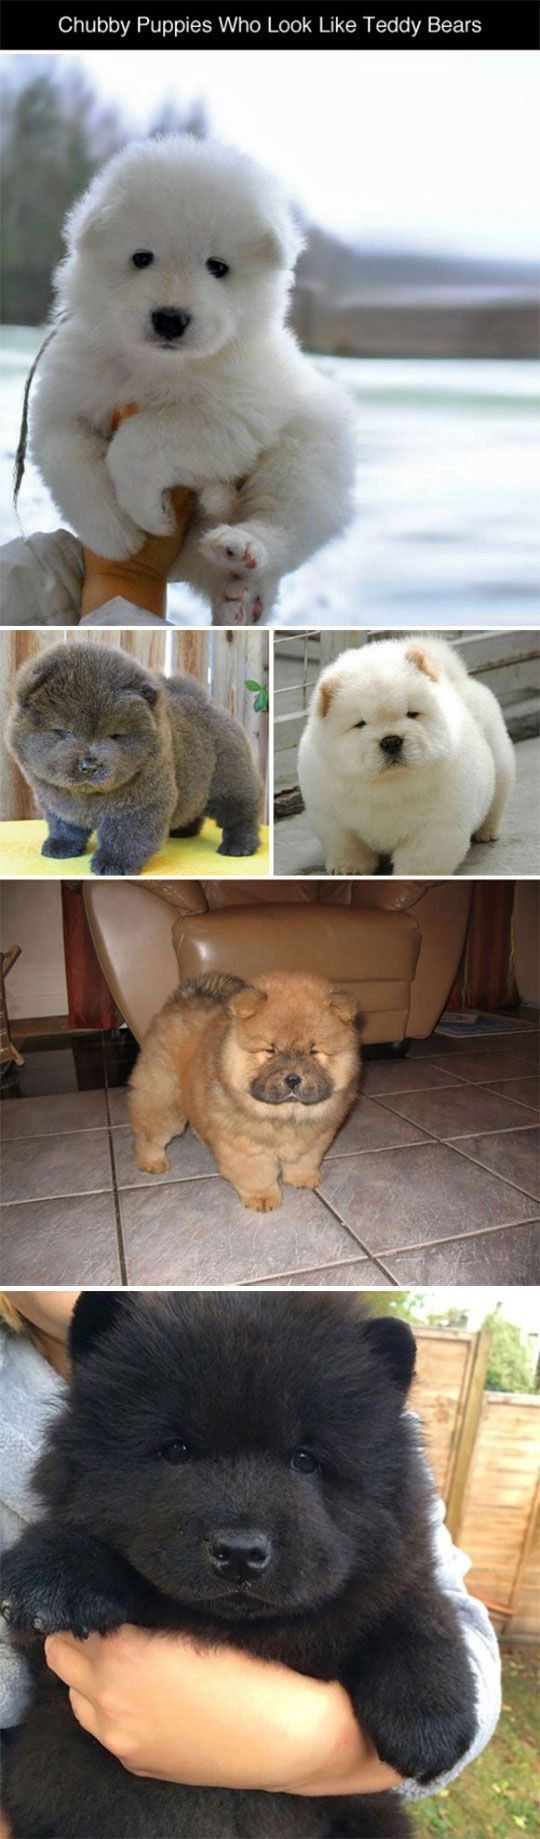 Best Teddy Bear Chubby Adorable Dog - 86b4a142043bdfc373164d2b5cff90de  Gallery_671084  .jpg